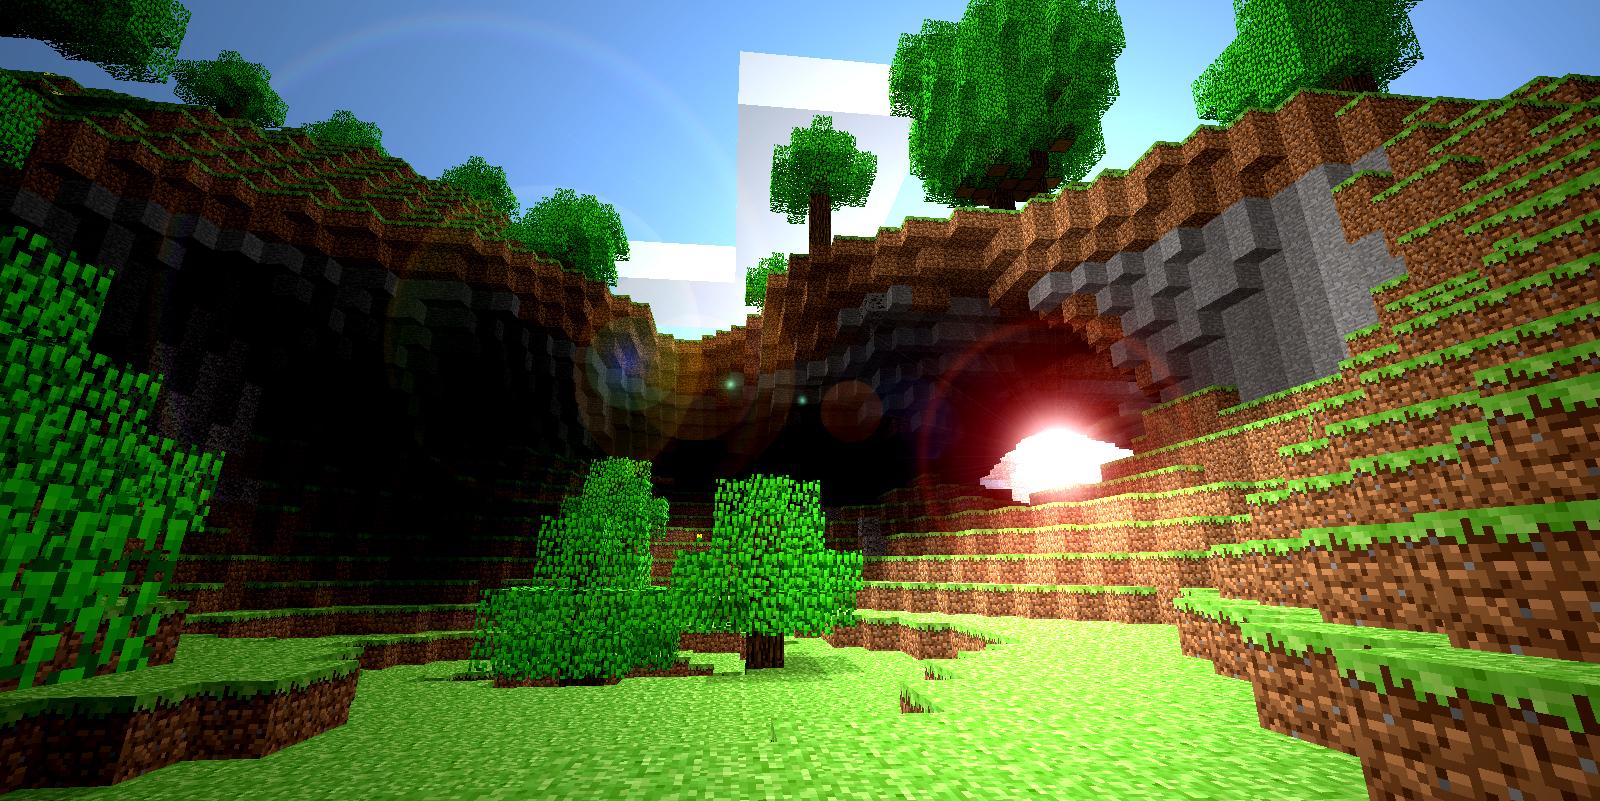 Wallpaper Minecraft 1600x801